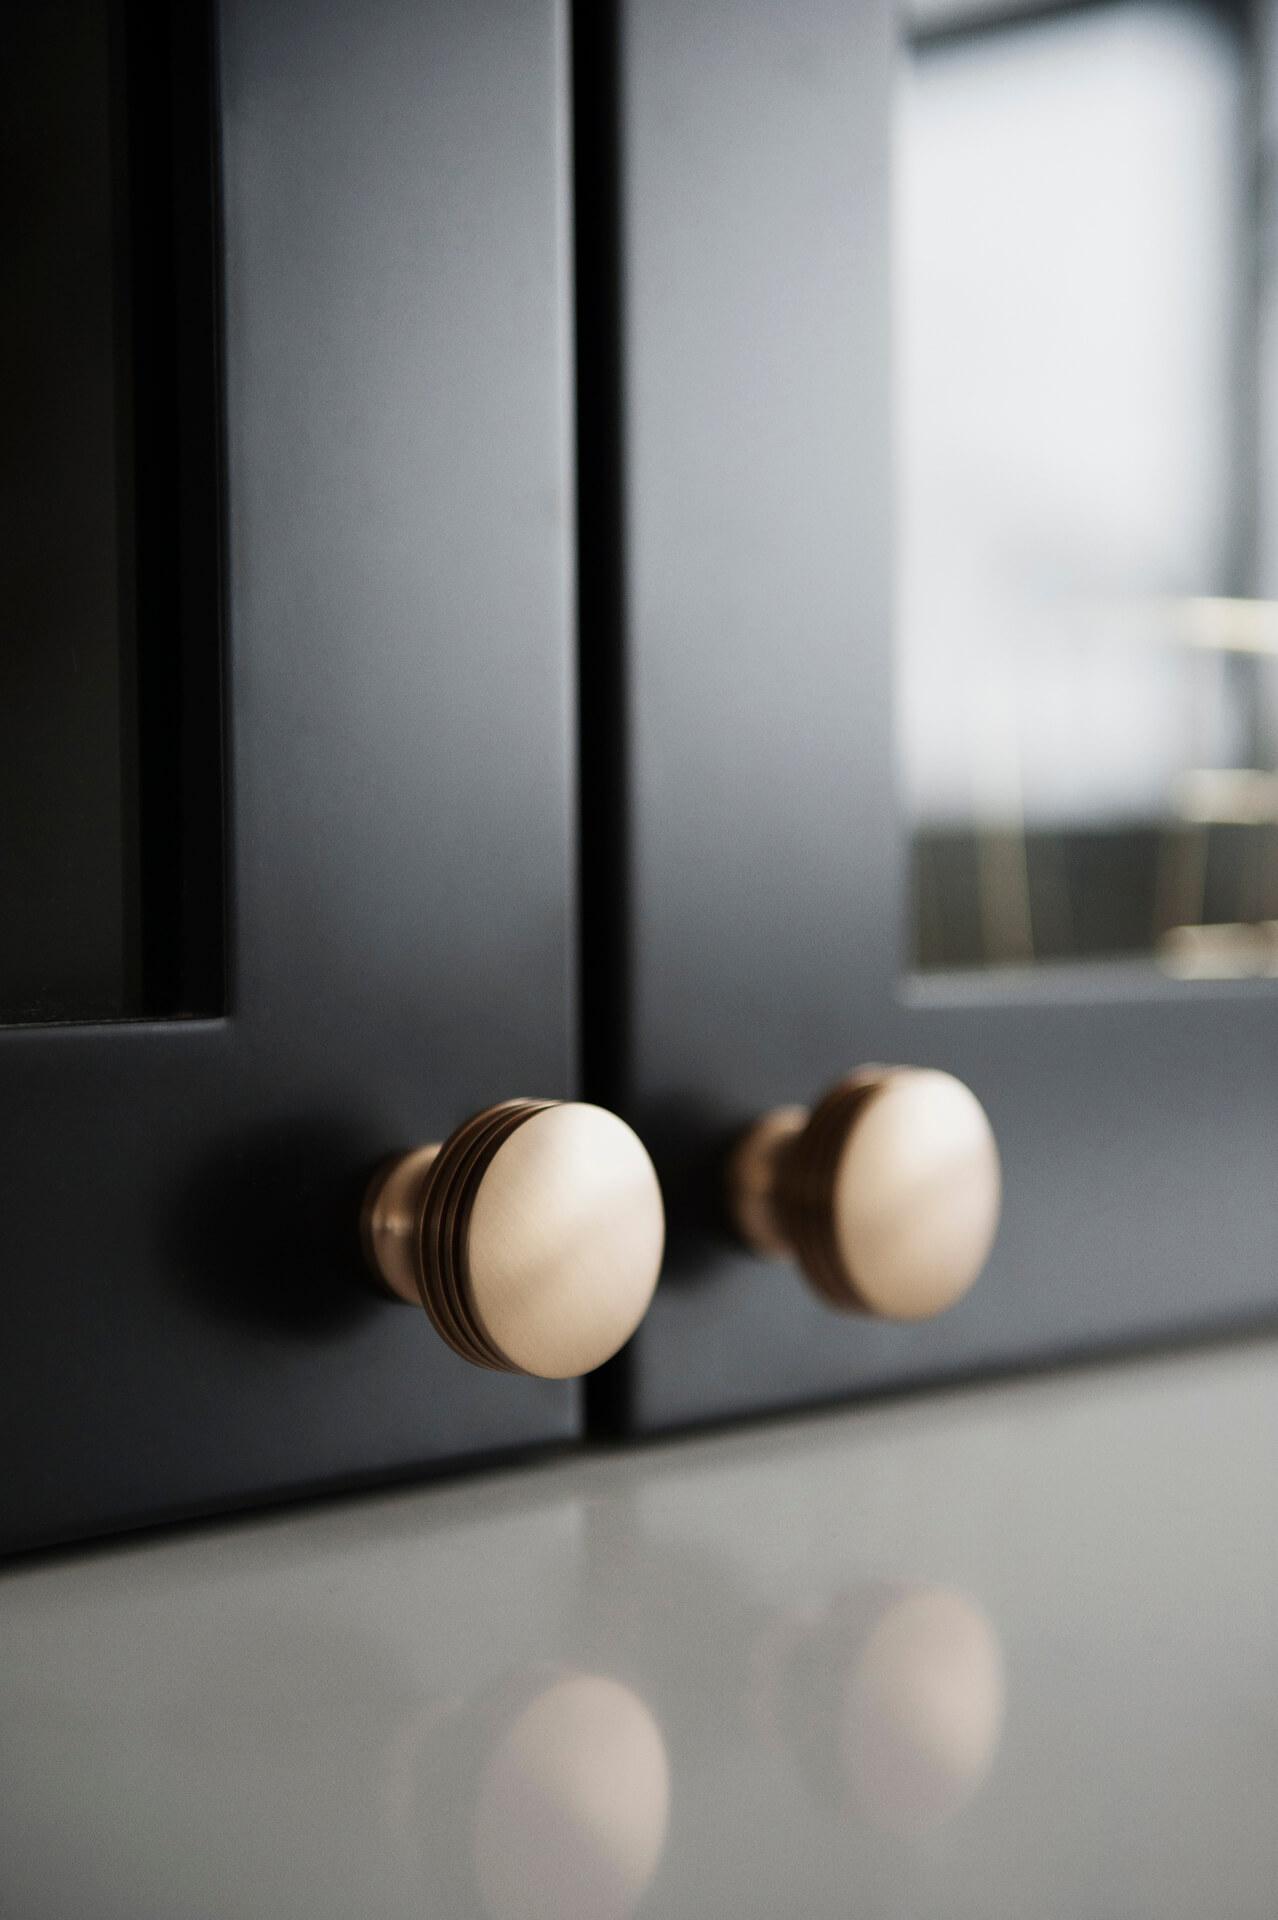 AKB Design cuisine blanche armoire noire poignee laiton comptoir quartz garde manger 26